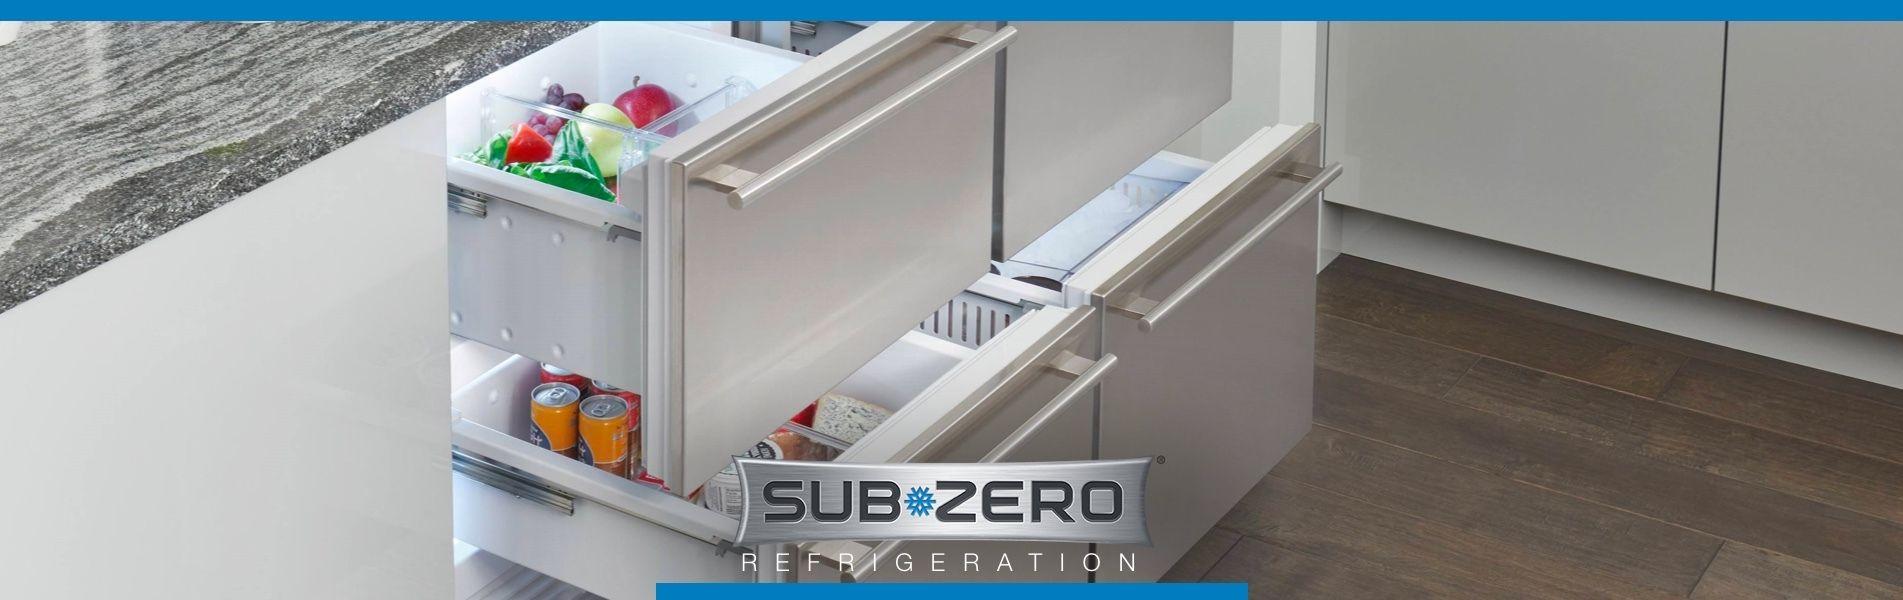 Sub-Zero-LandingPage